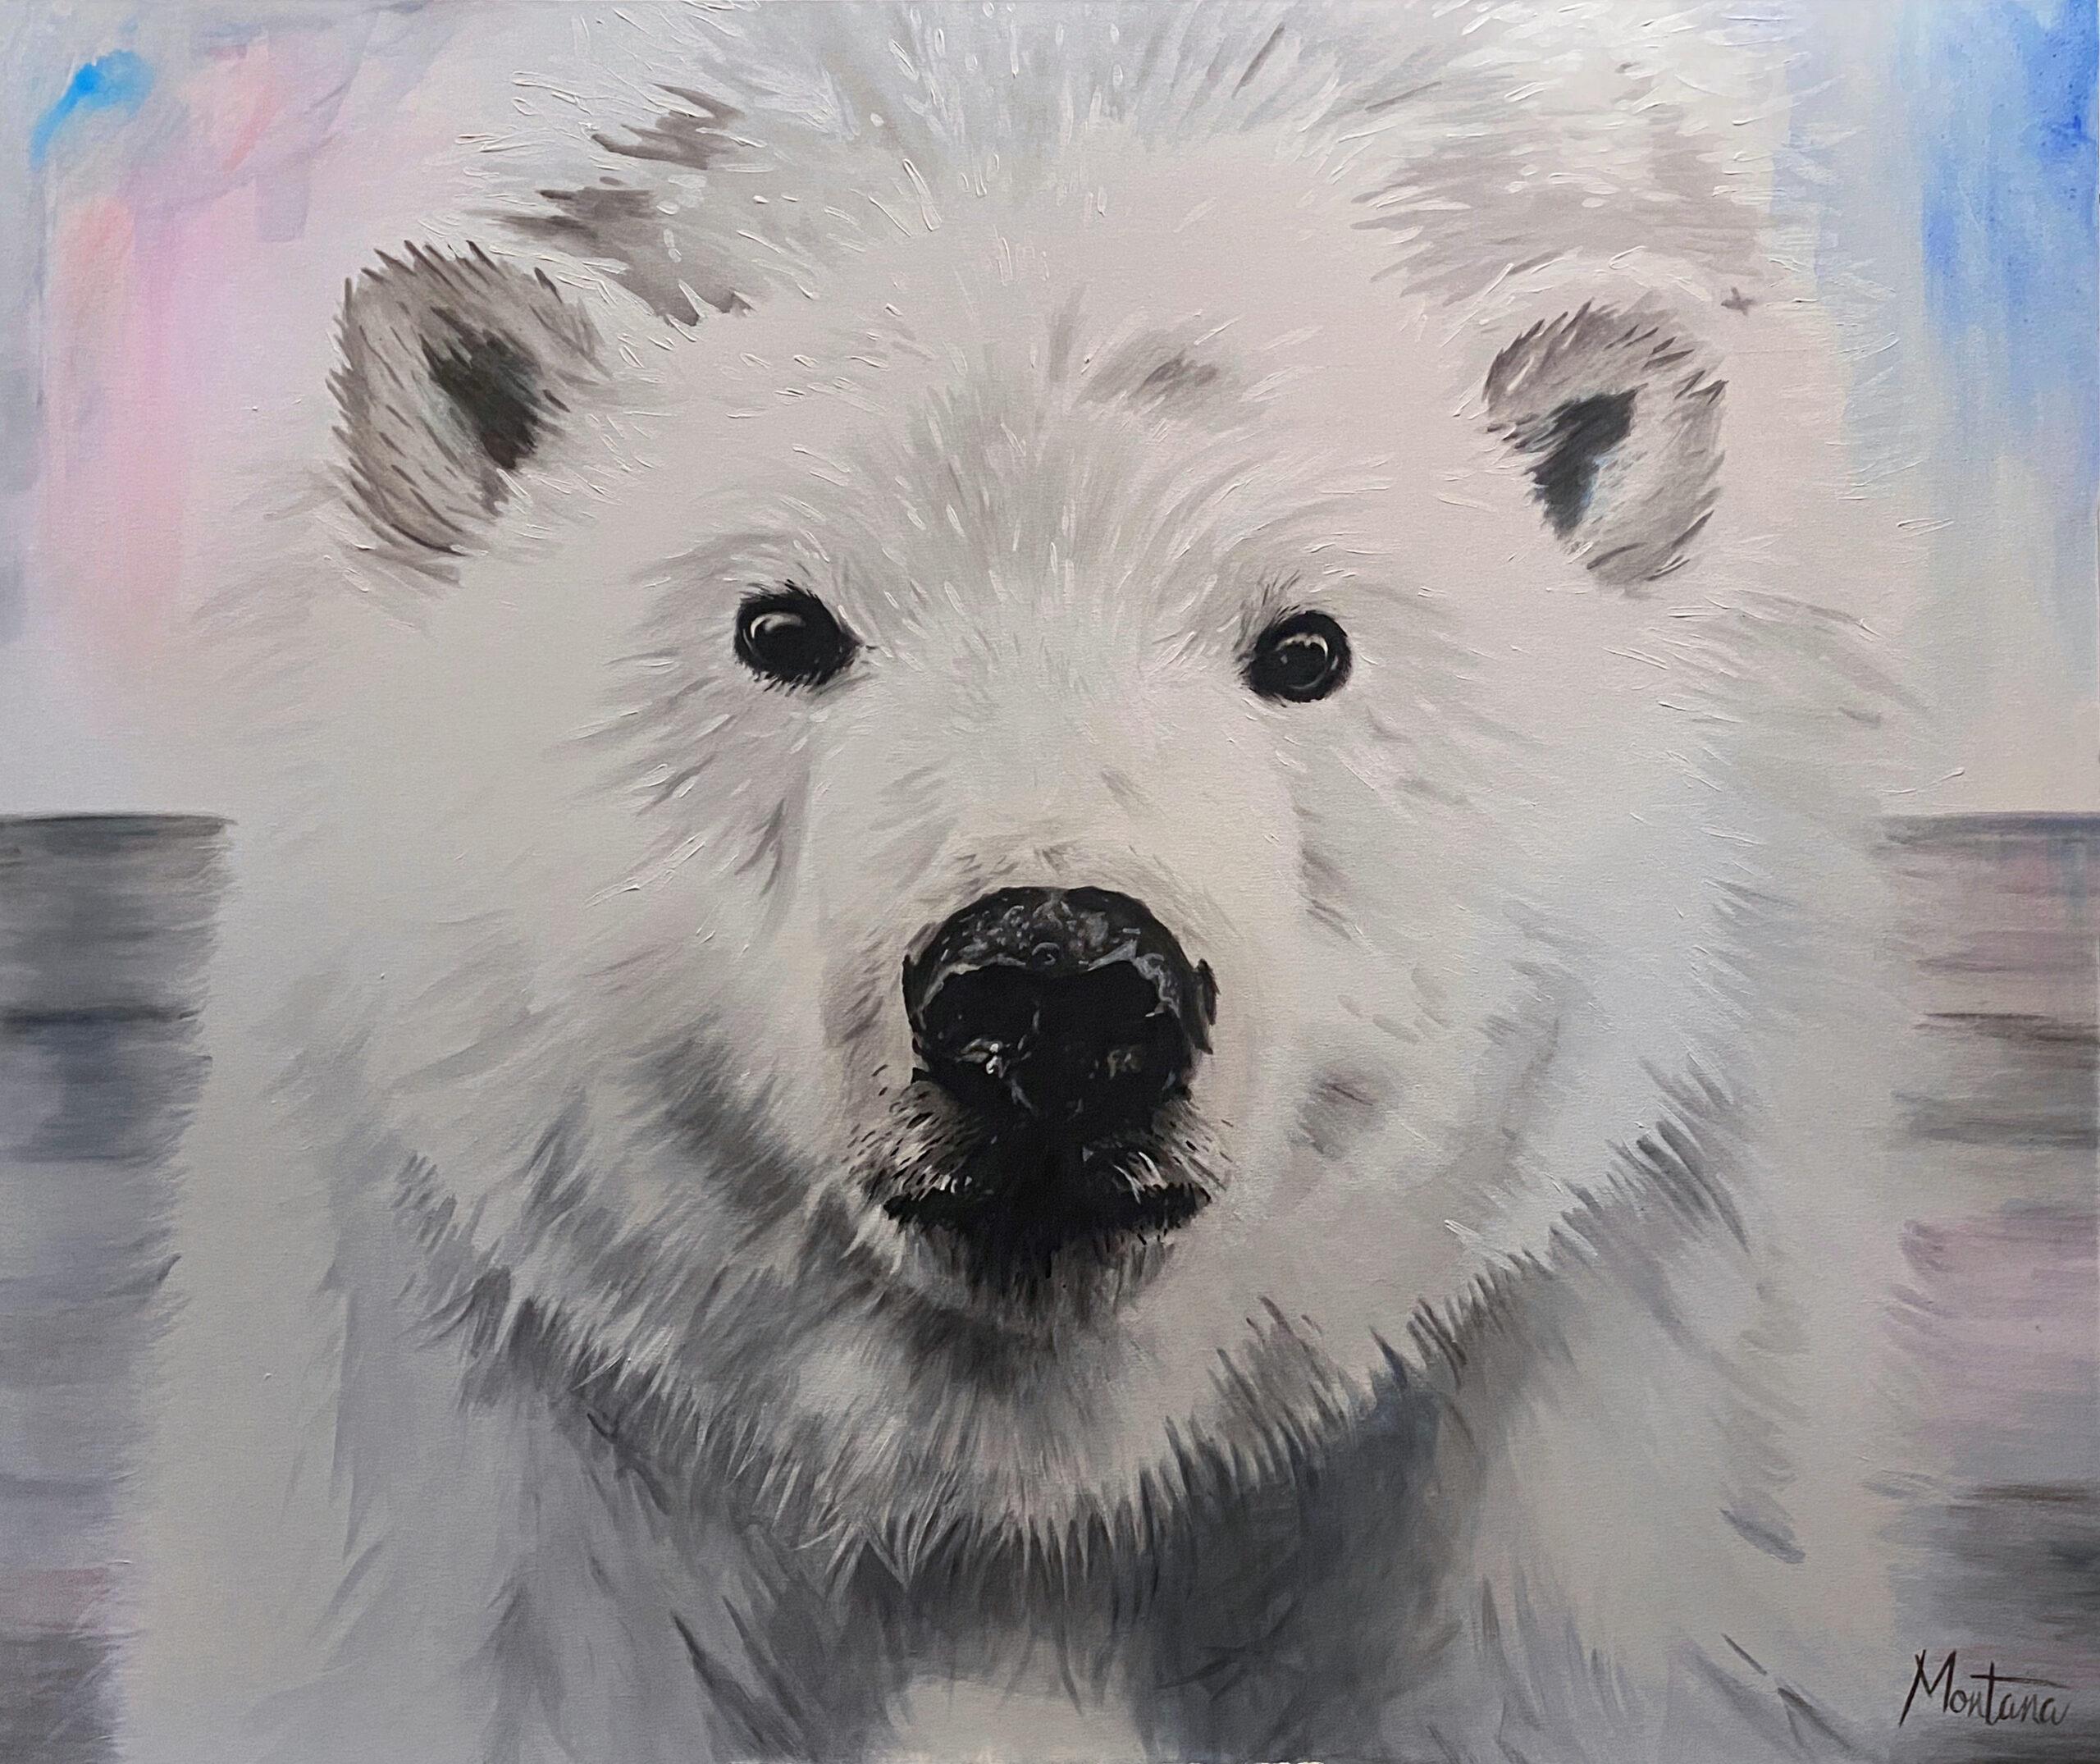 montana-engels-icebear-animal-painting-belgian-painter-portrait